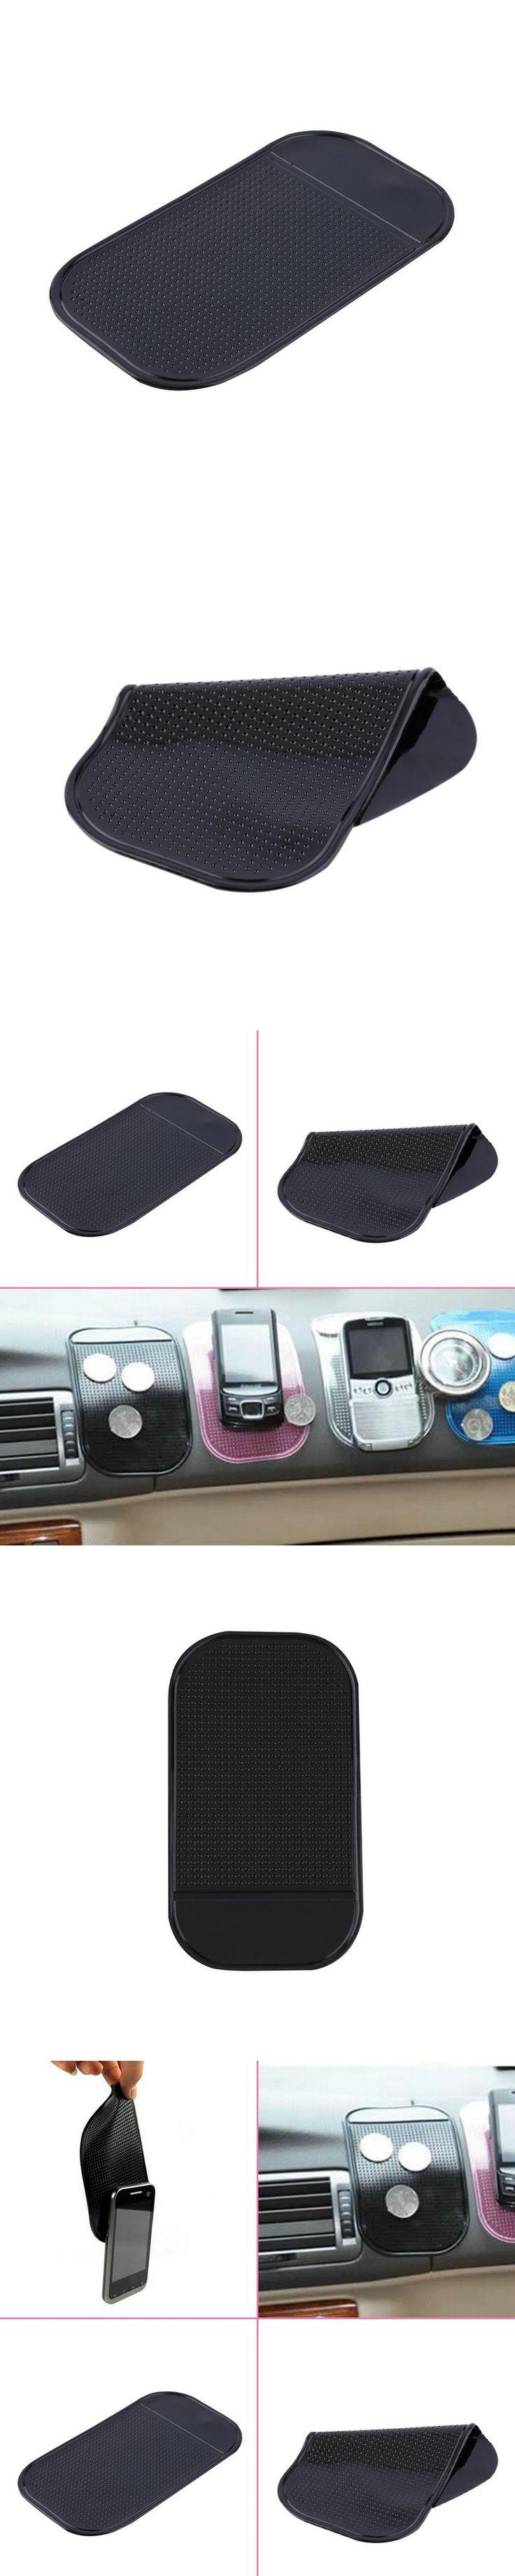 1pc Anti Slip Mat Black Car Dashboard Sticky 1pcs Magic Sticky Pad Holder Pad Silica Gel For Car Mobile Phone Car Accessories